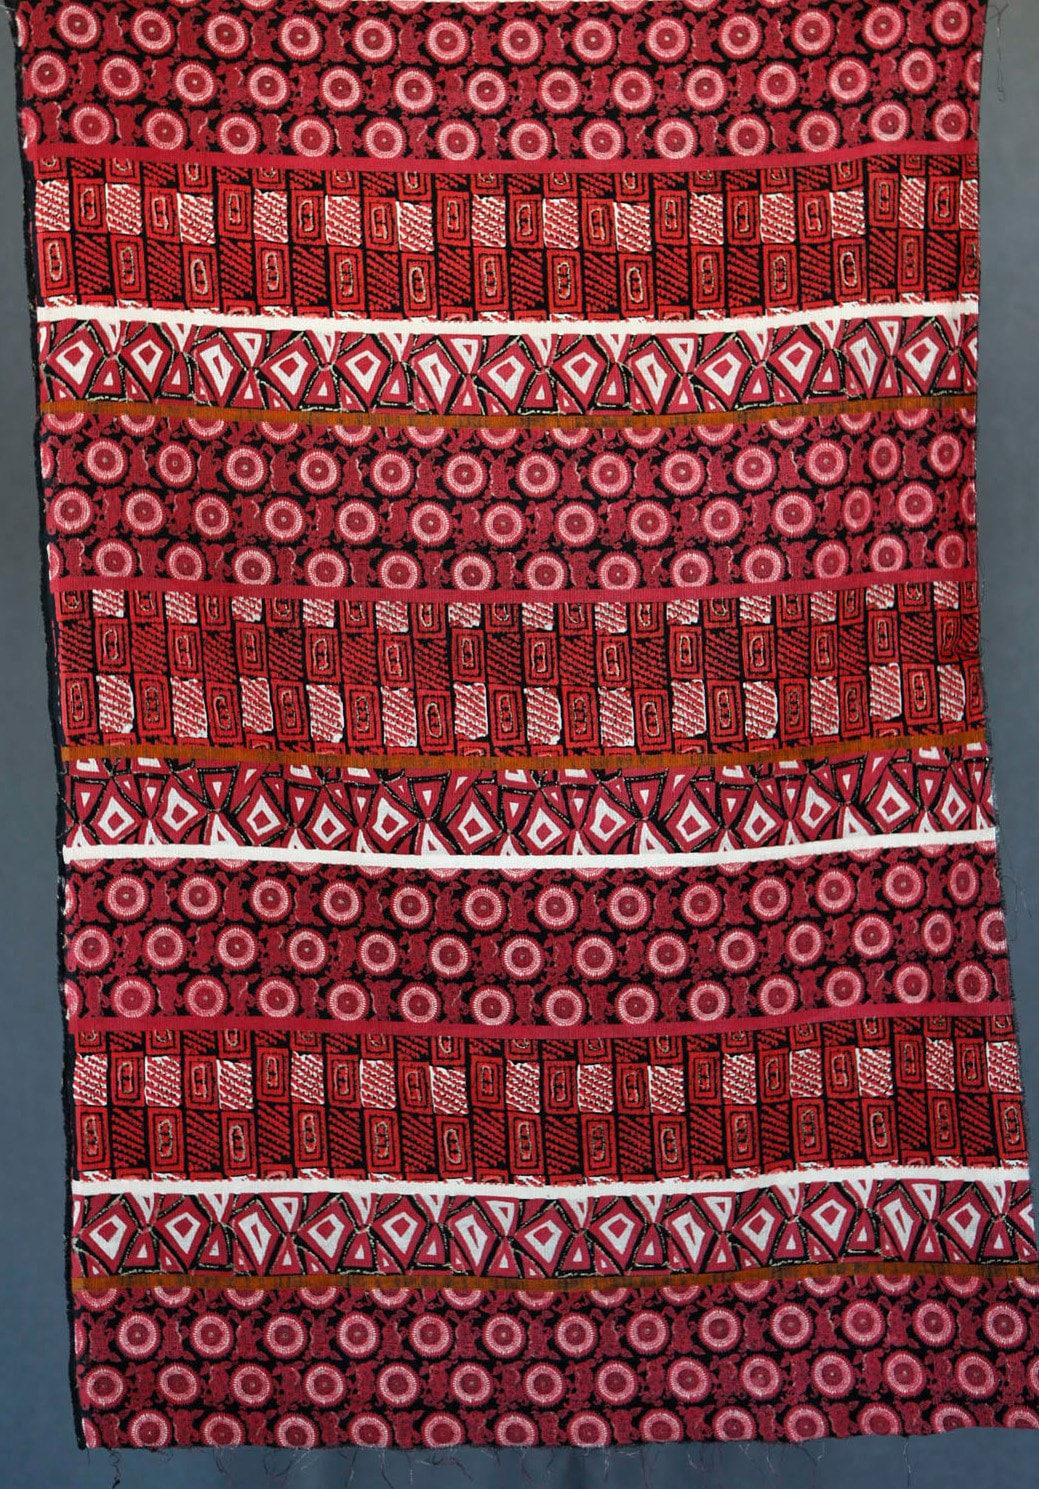 Pink red black corduroy fabric with circular geometric